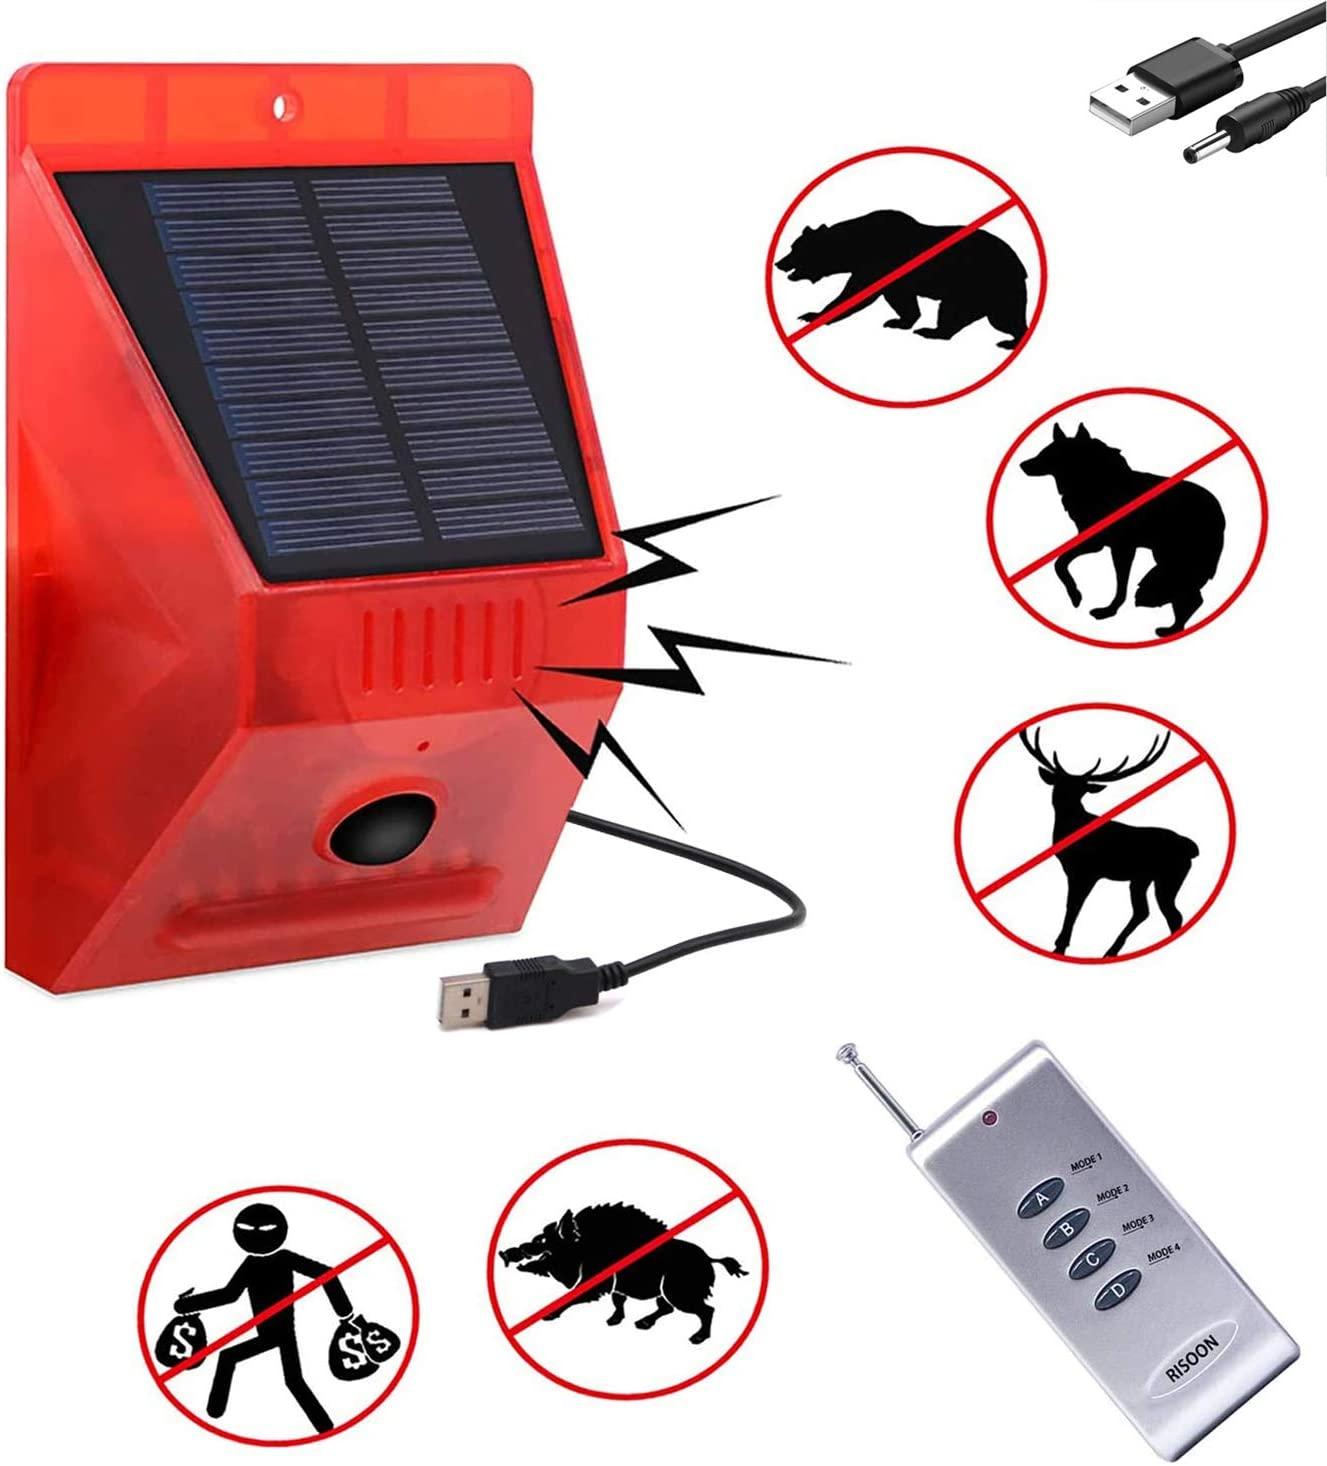 RISOON Solar Strobe Light with Remote Controller, Solar Alarm Light with Motion Detector Solar Alarm Light 129db Sound Security Siren IP65 Waterproof, Protected Your Home, Farm, Barn, Barn,Villa,Yard